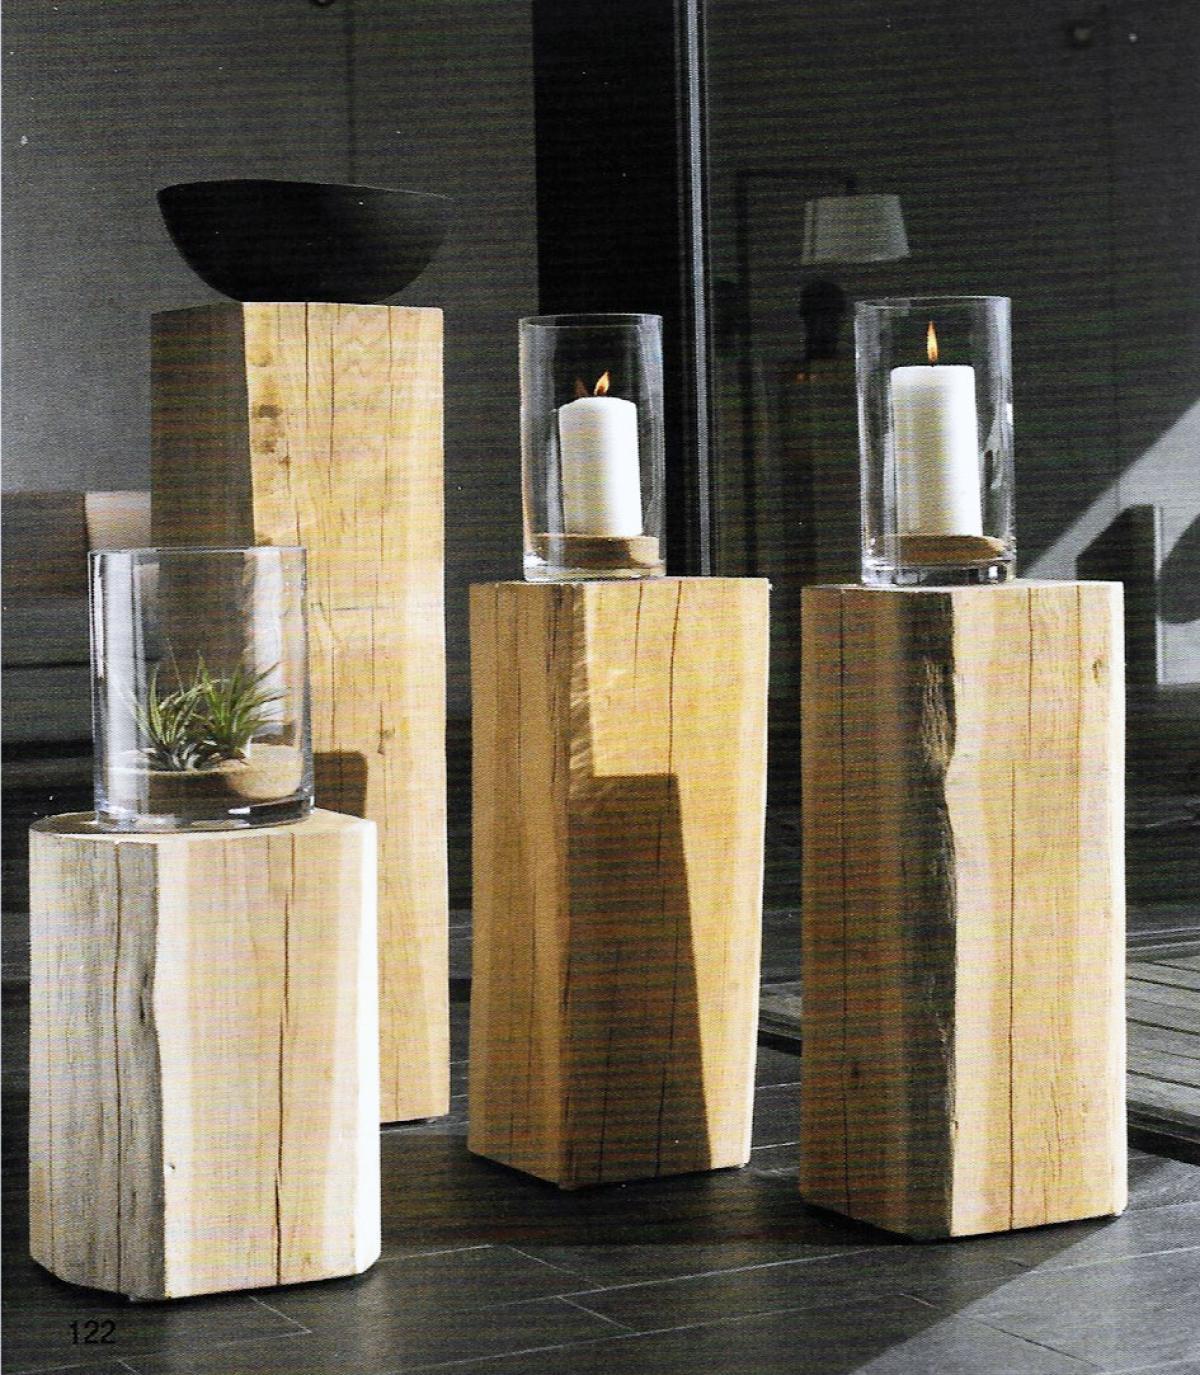 wohnaccessoires raumausbeute. Black Bedroom Furniture Sets. Home Design Ideas